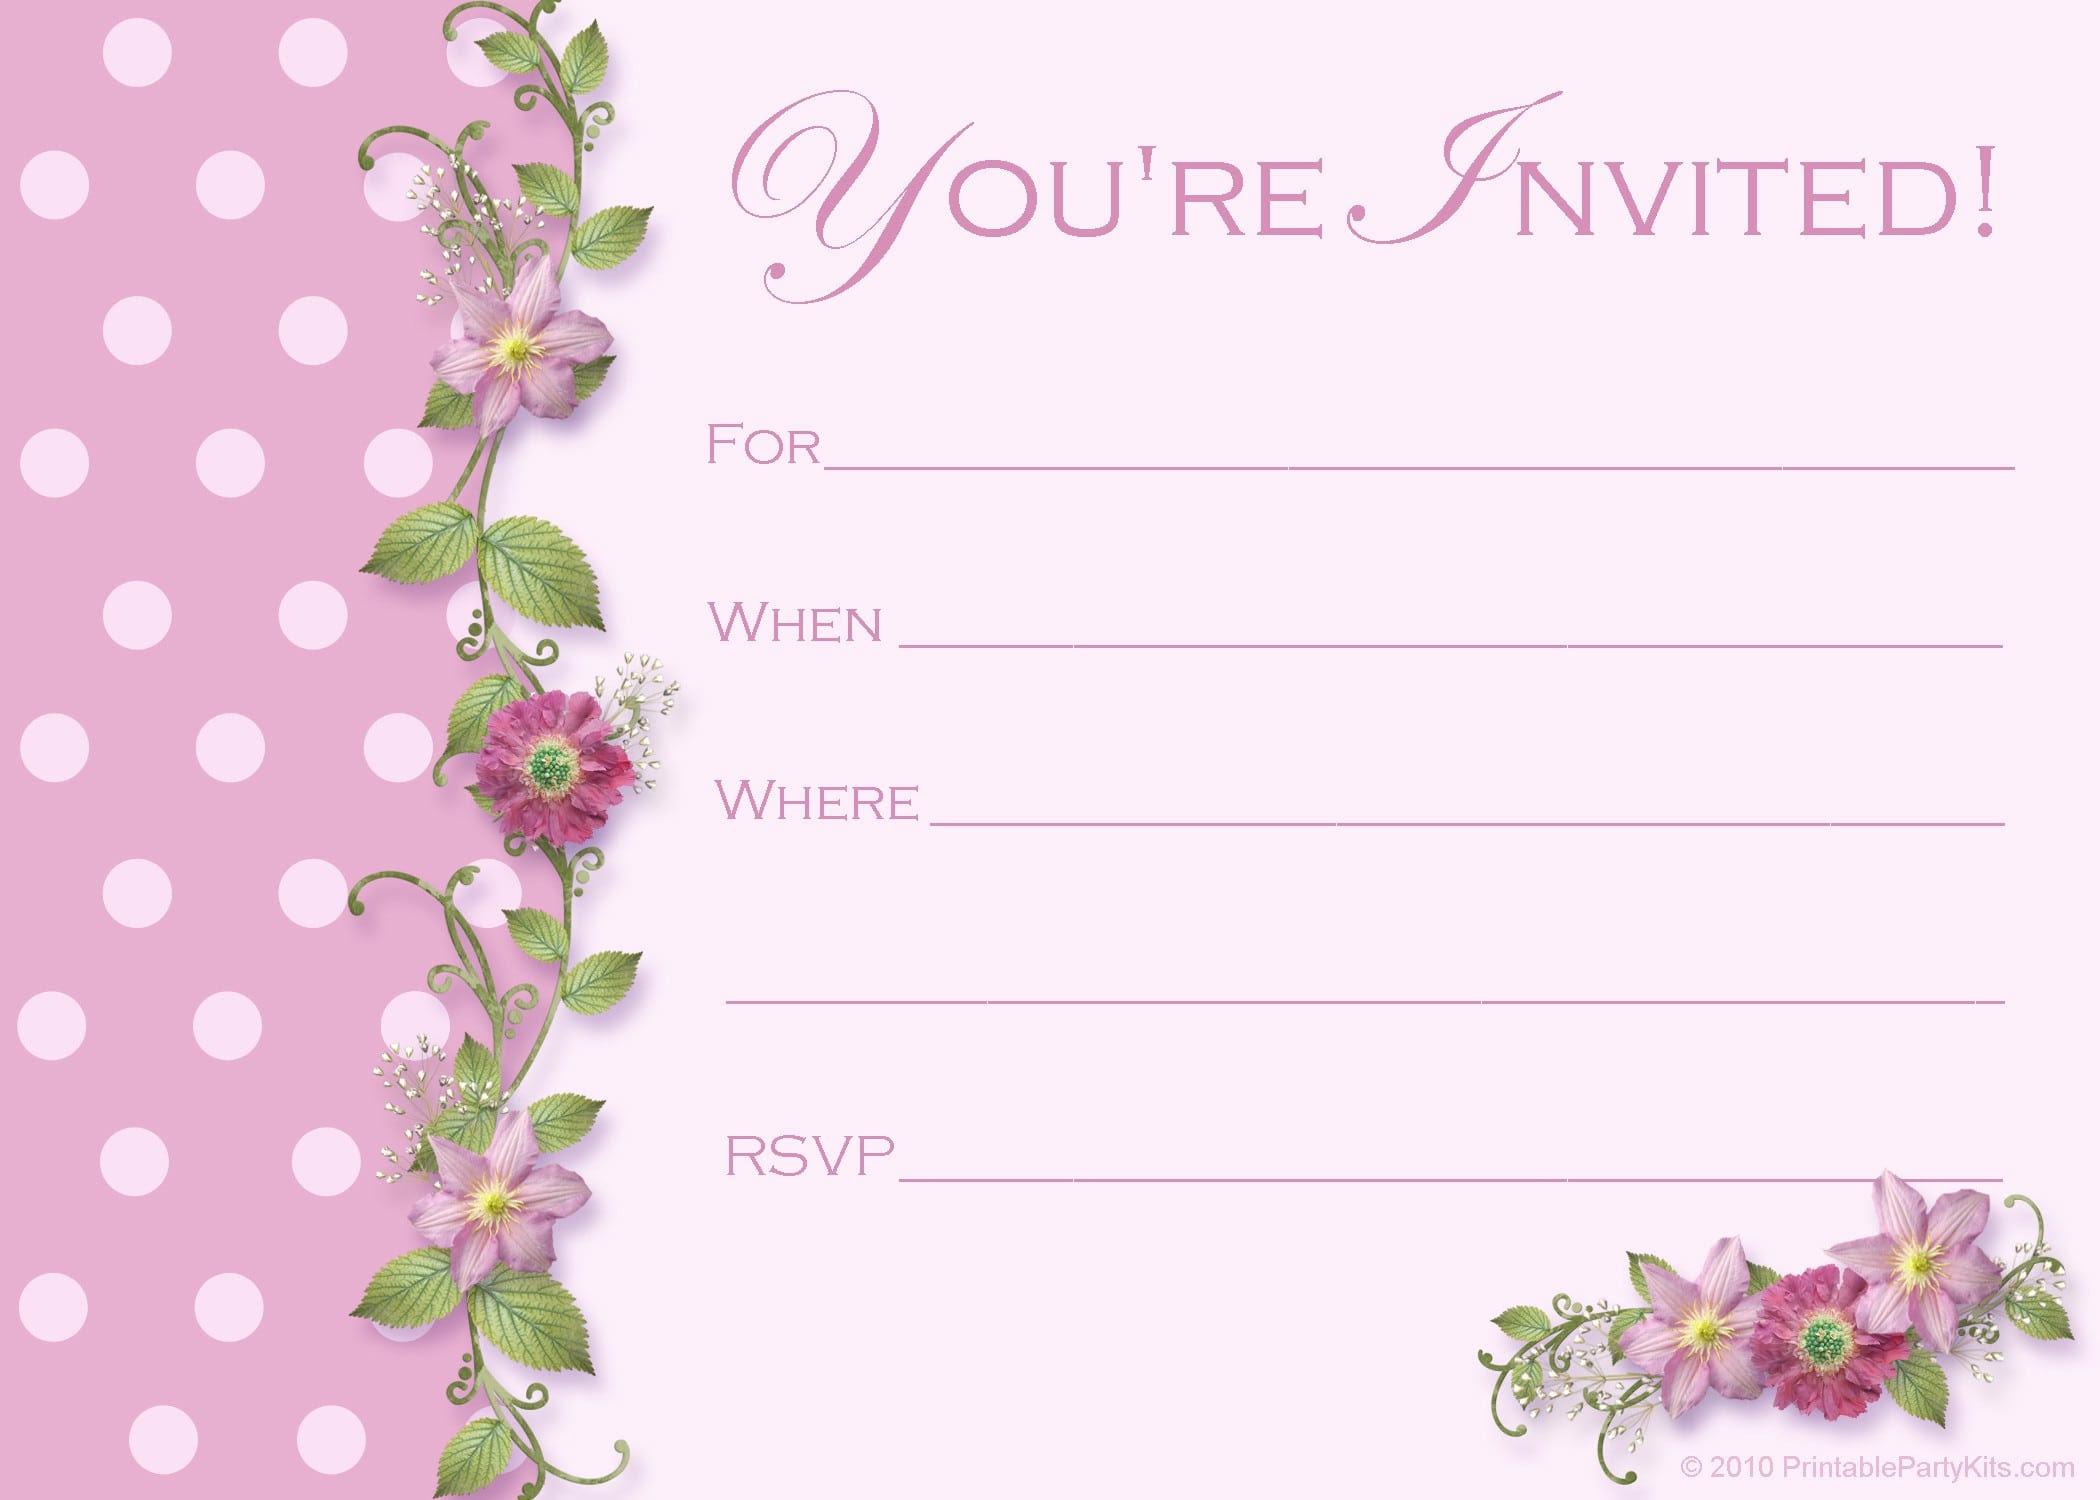 FREE PRINTABLE INVITATIONS On Pinterest Free Printable Party Owl ...